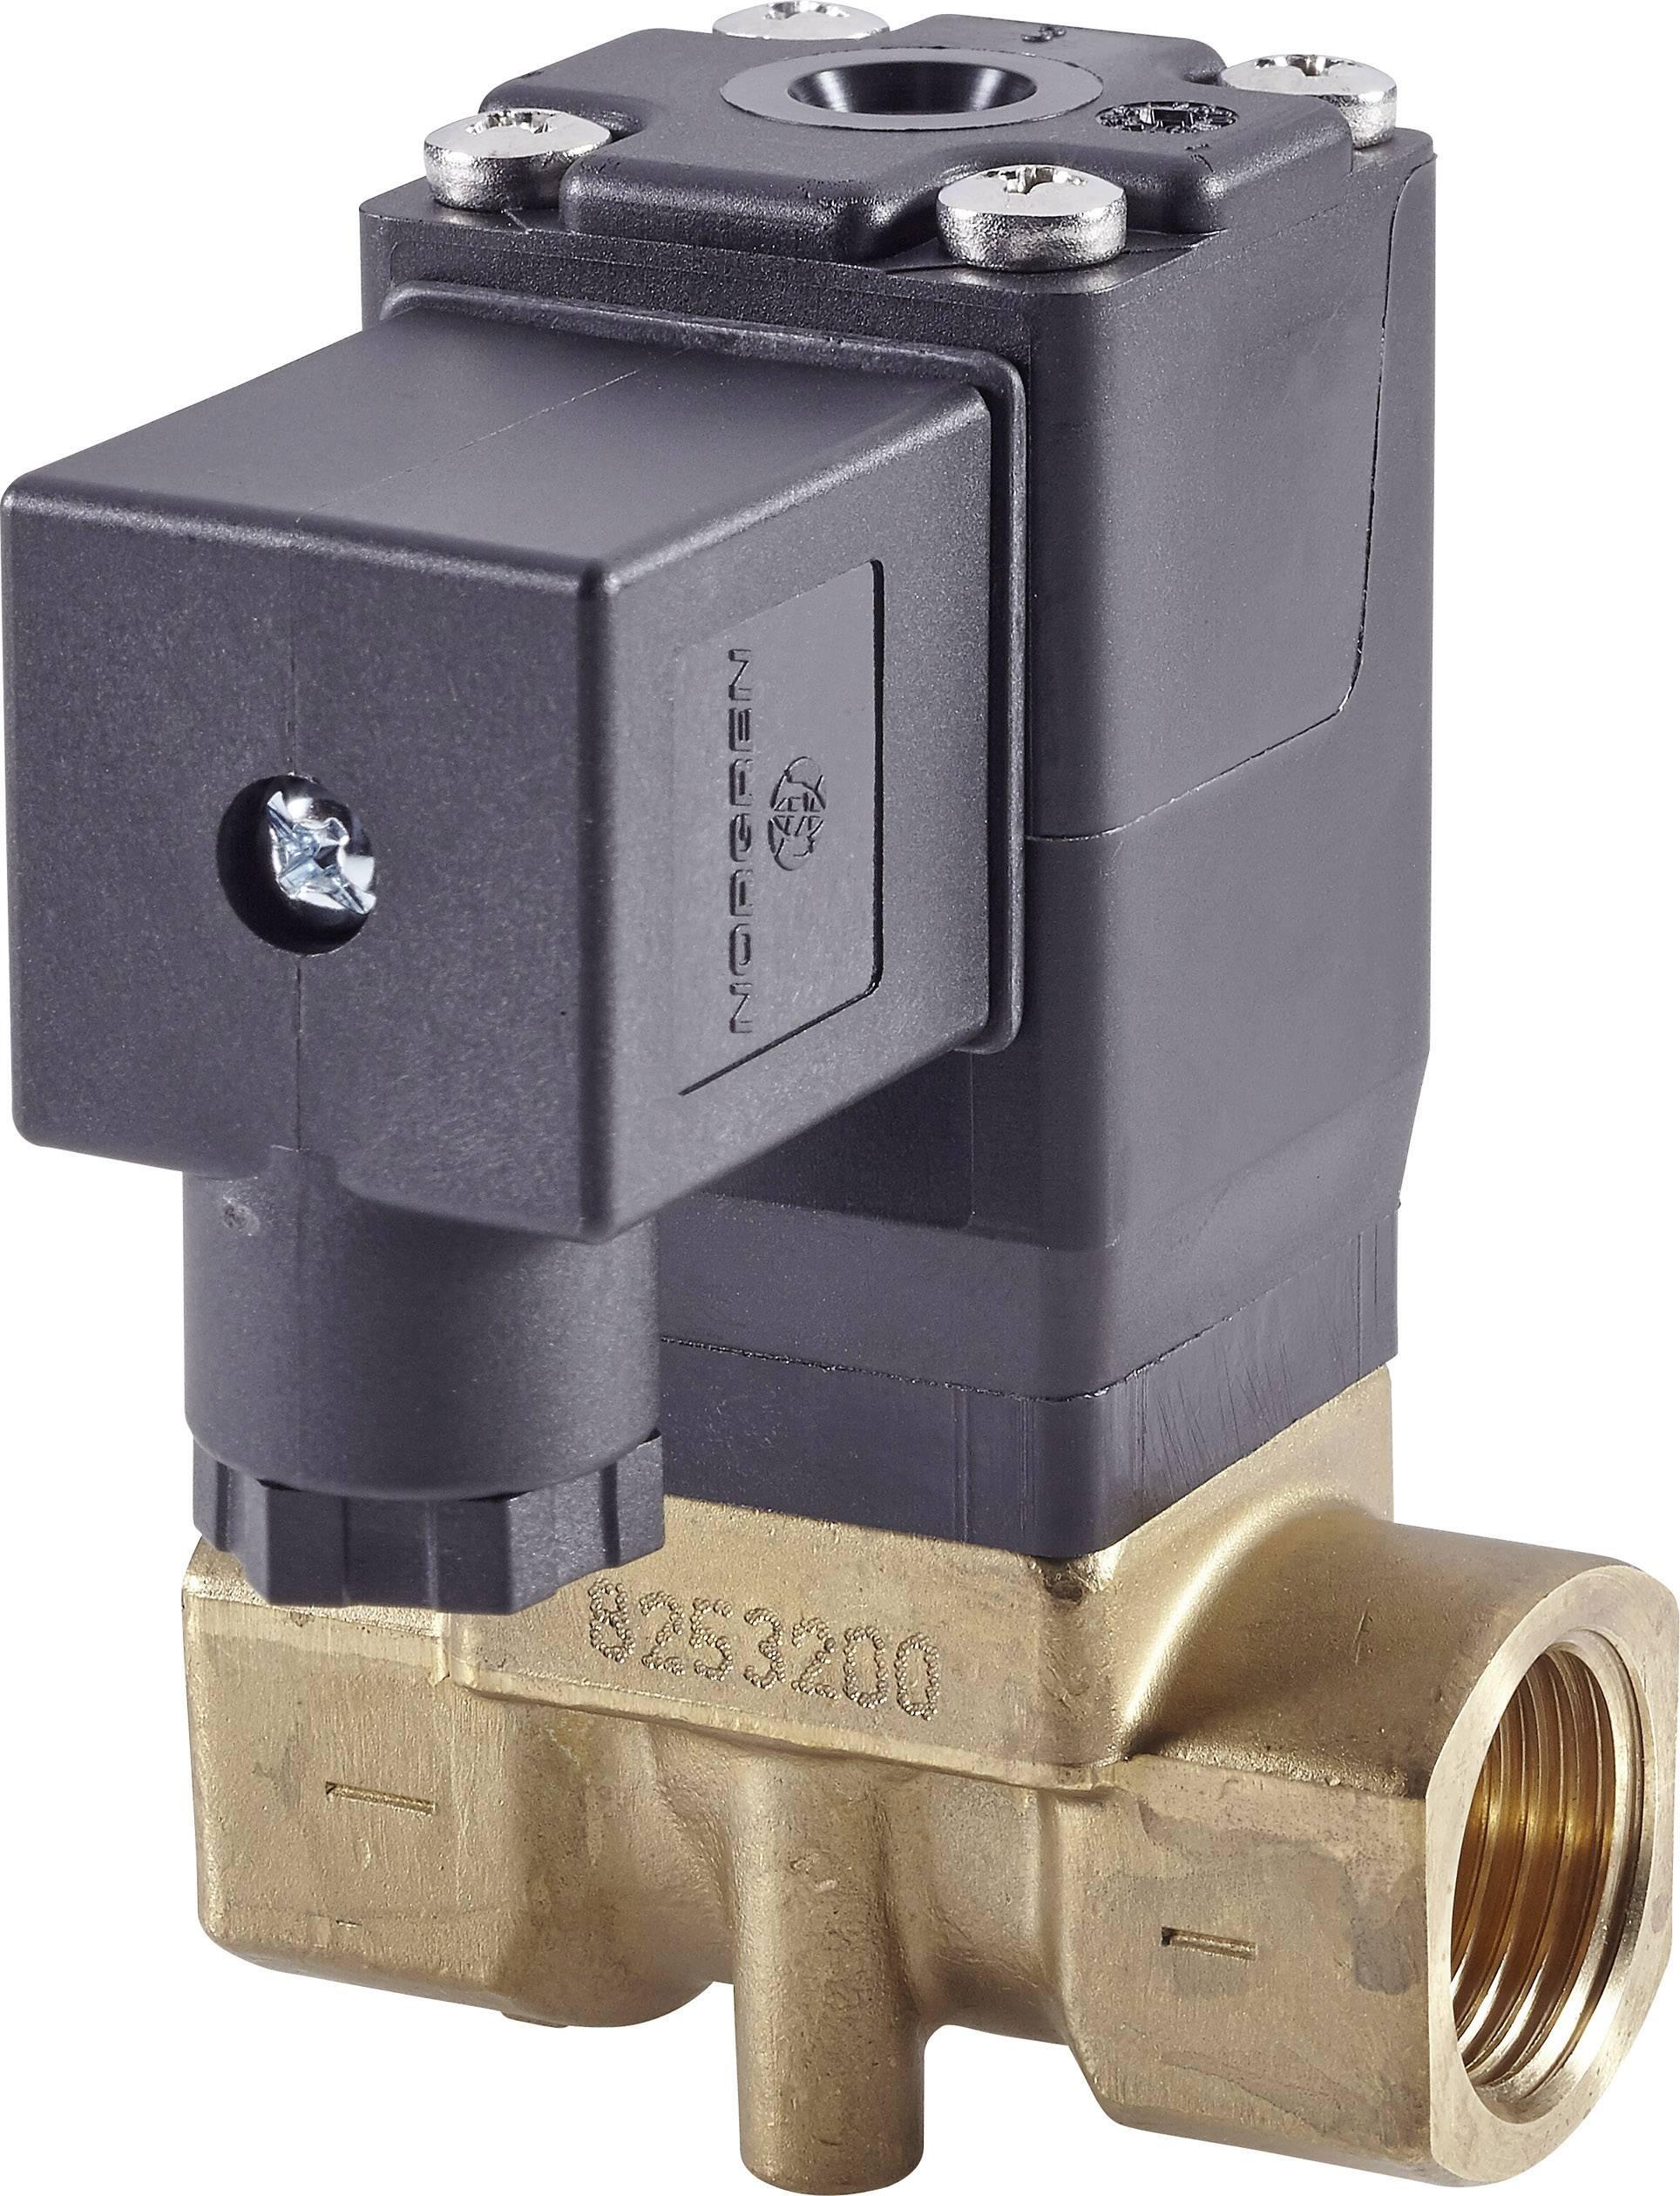 2/2-cestný mechanicky odolný ventil pneumatiky Busch Jost 8253200.8001.02400, G 1/2, 24 V/DC